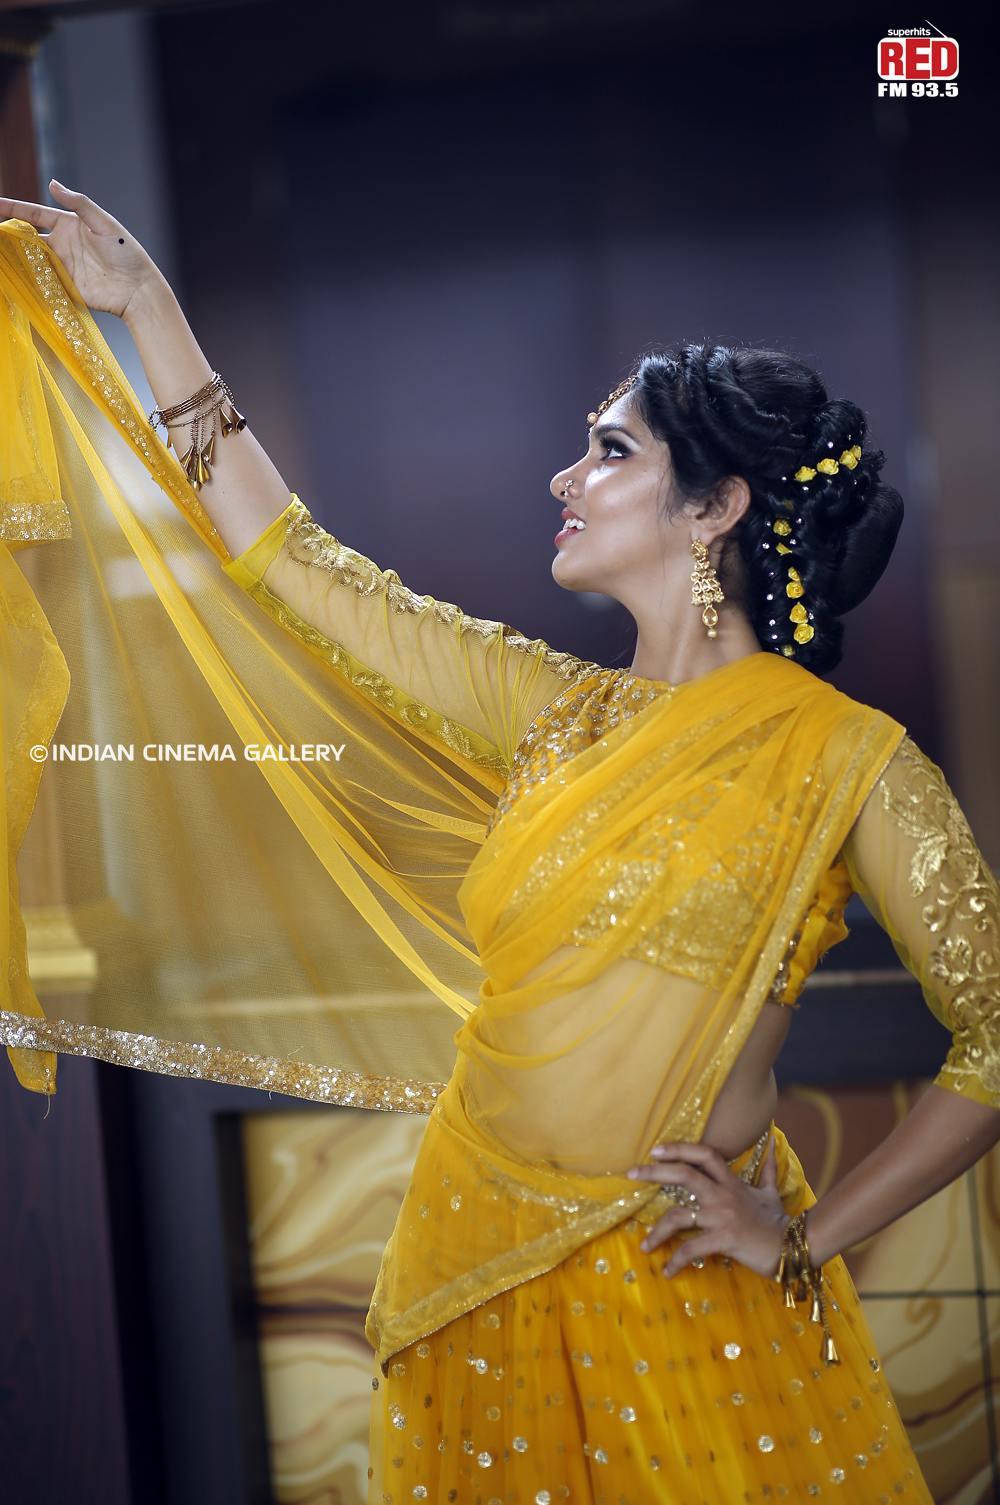 Gayathri Suresh dance at red fm music awards 2019 (16)